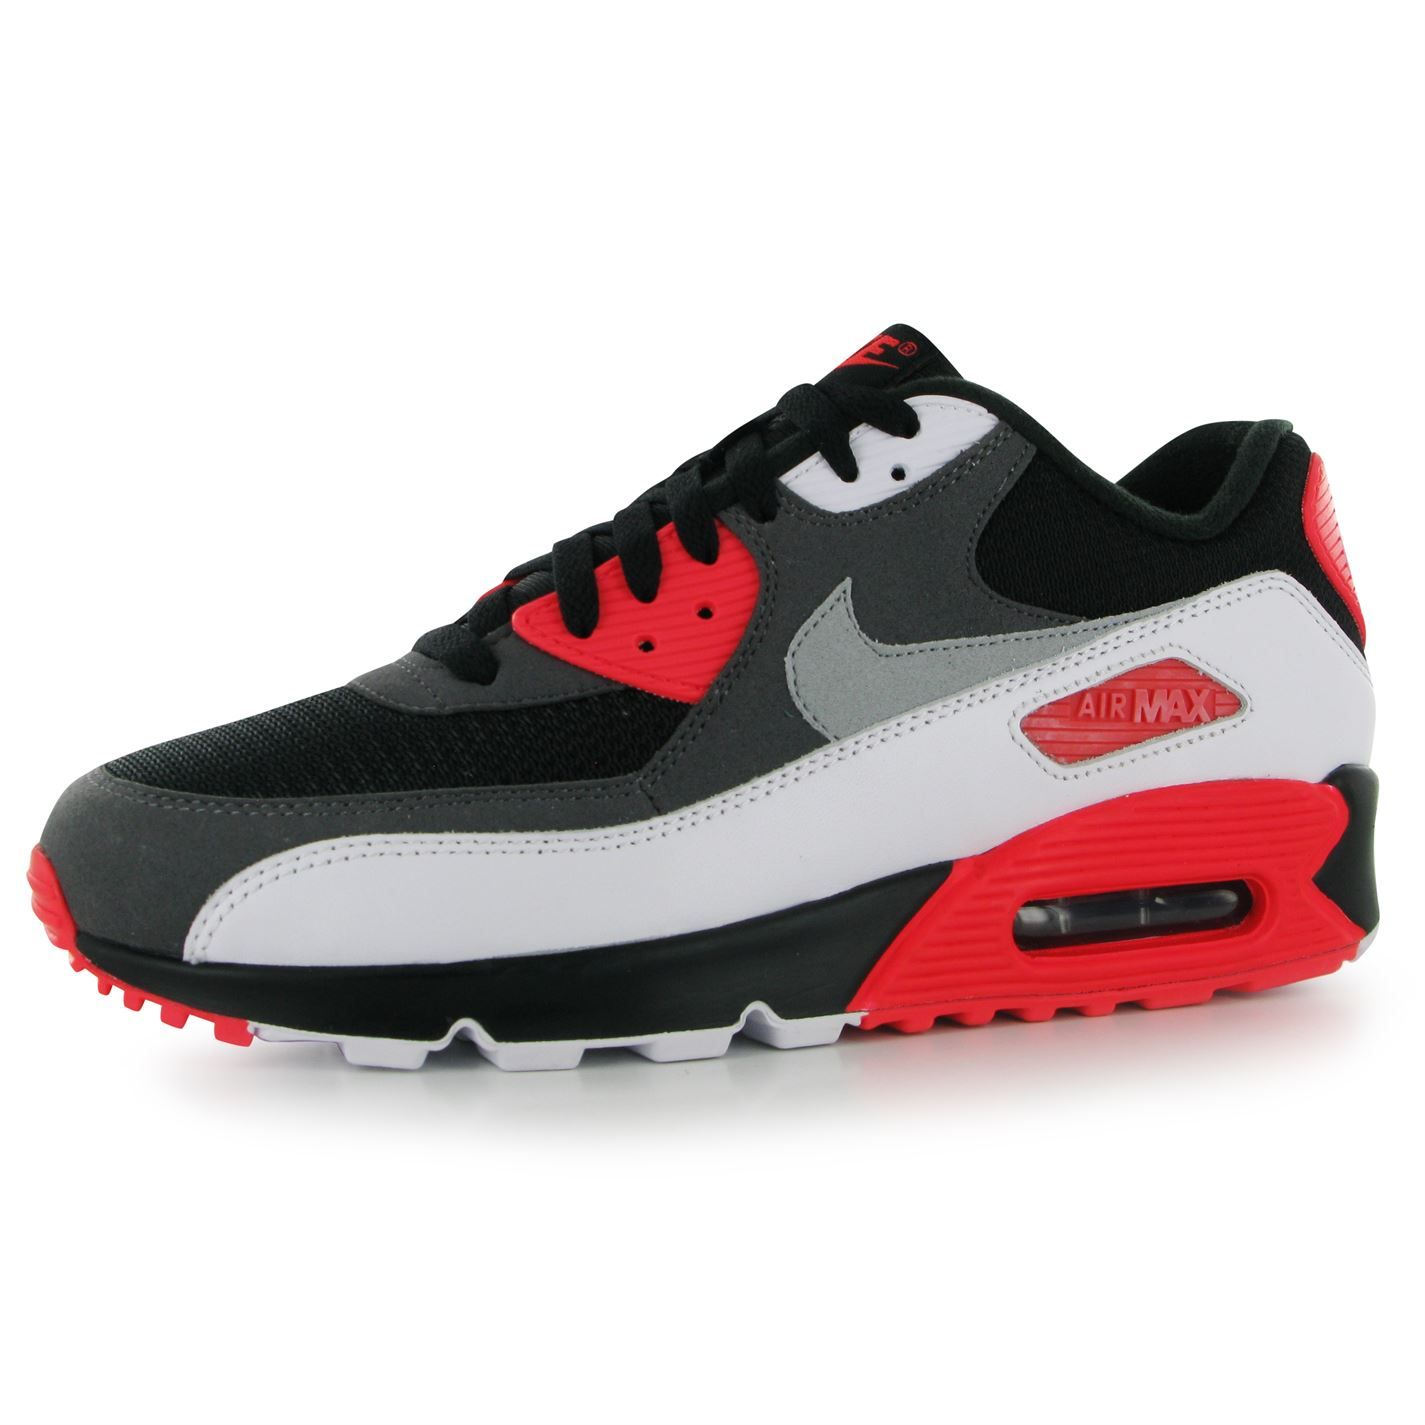 best service 6019b ec411 Nike | Air Max 90 OG Men's Trainers | Men's Trainers | awe ...